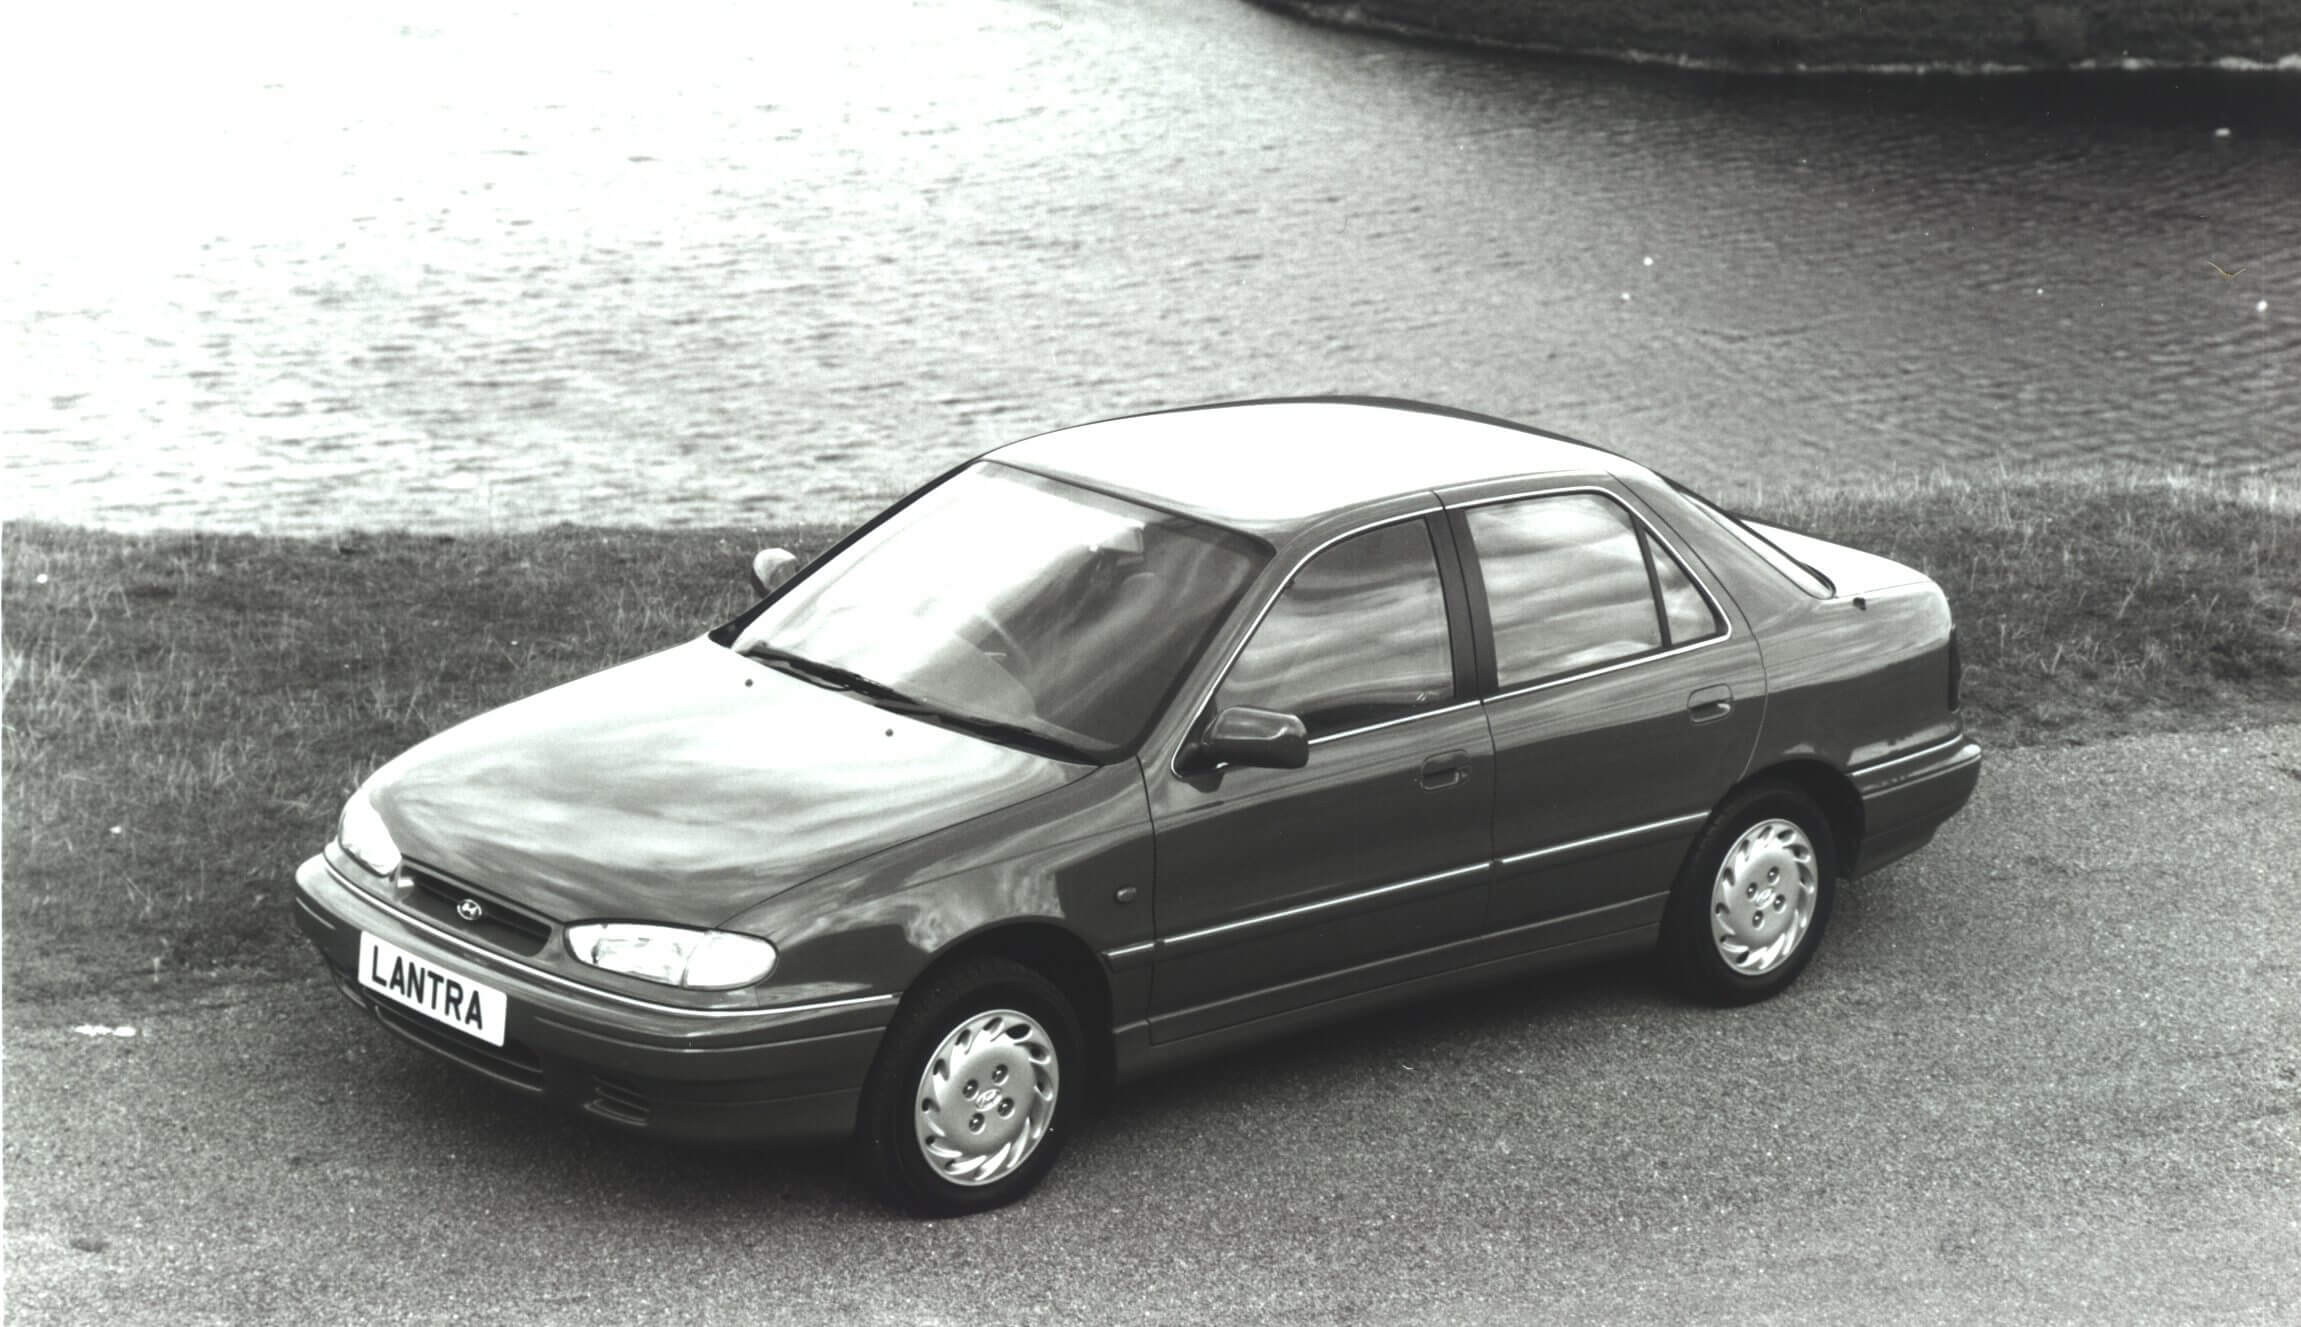 Diesel Hyundai Lantra